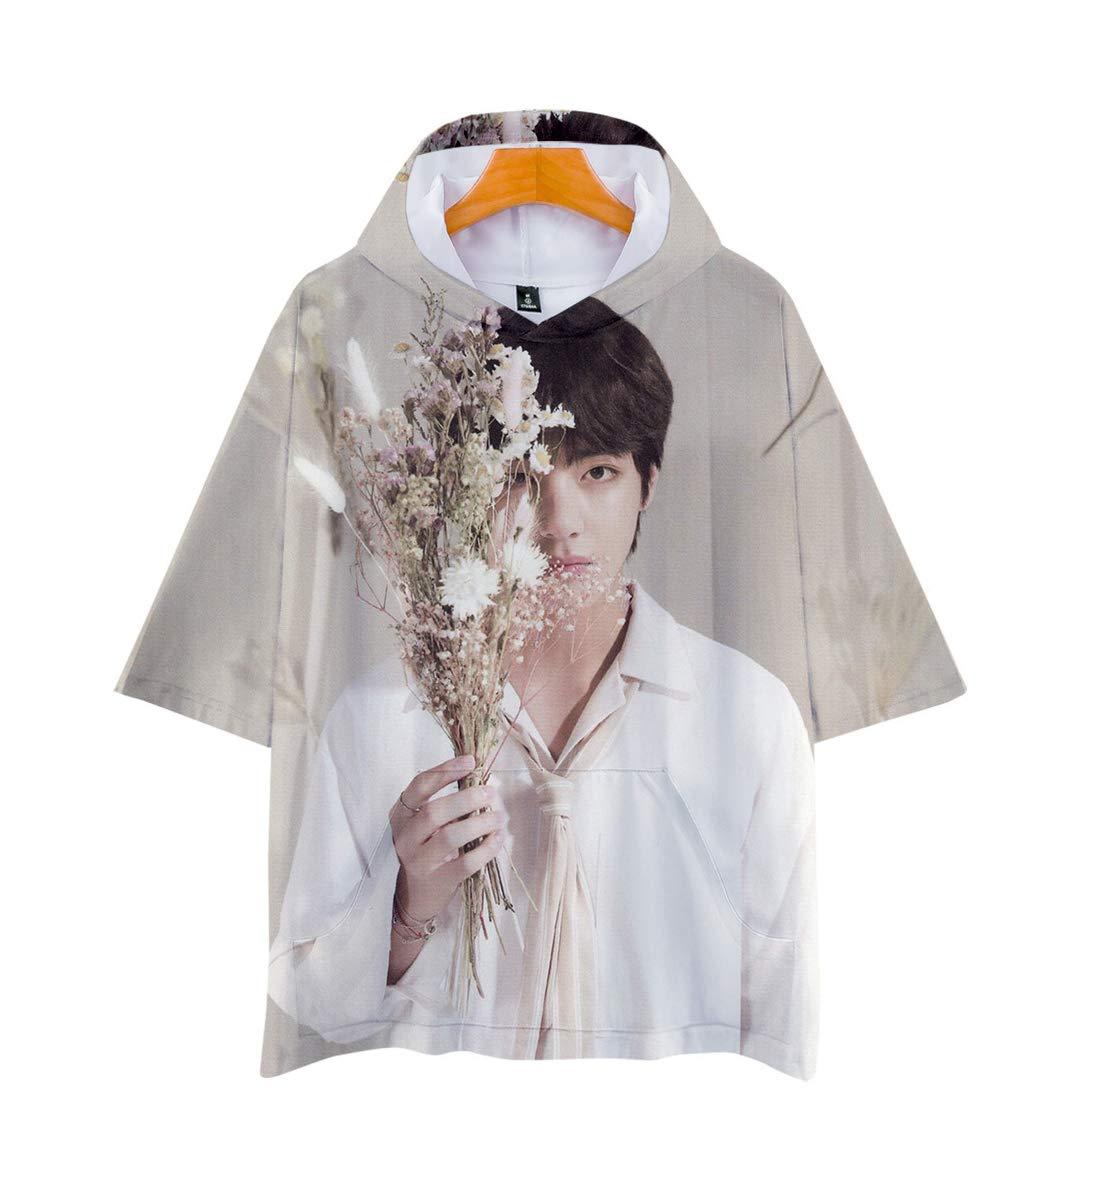 APHT Unisex BTS 3D Hoodie Short Sleeve T-Shirt for Men Women Teen Bangtan Boys Jin Suga J-Hope RM Jimin V Jung Kook Summer Tops Sweater Pullover Jackets